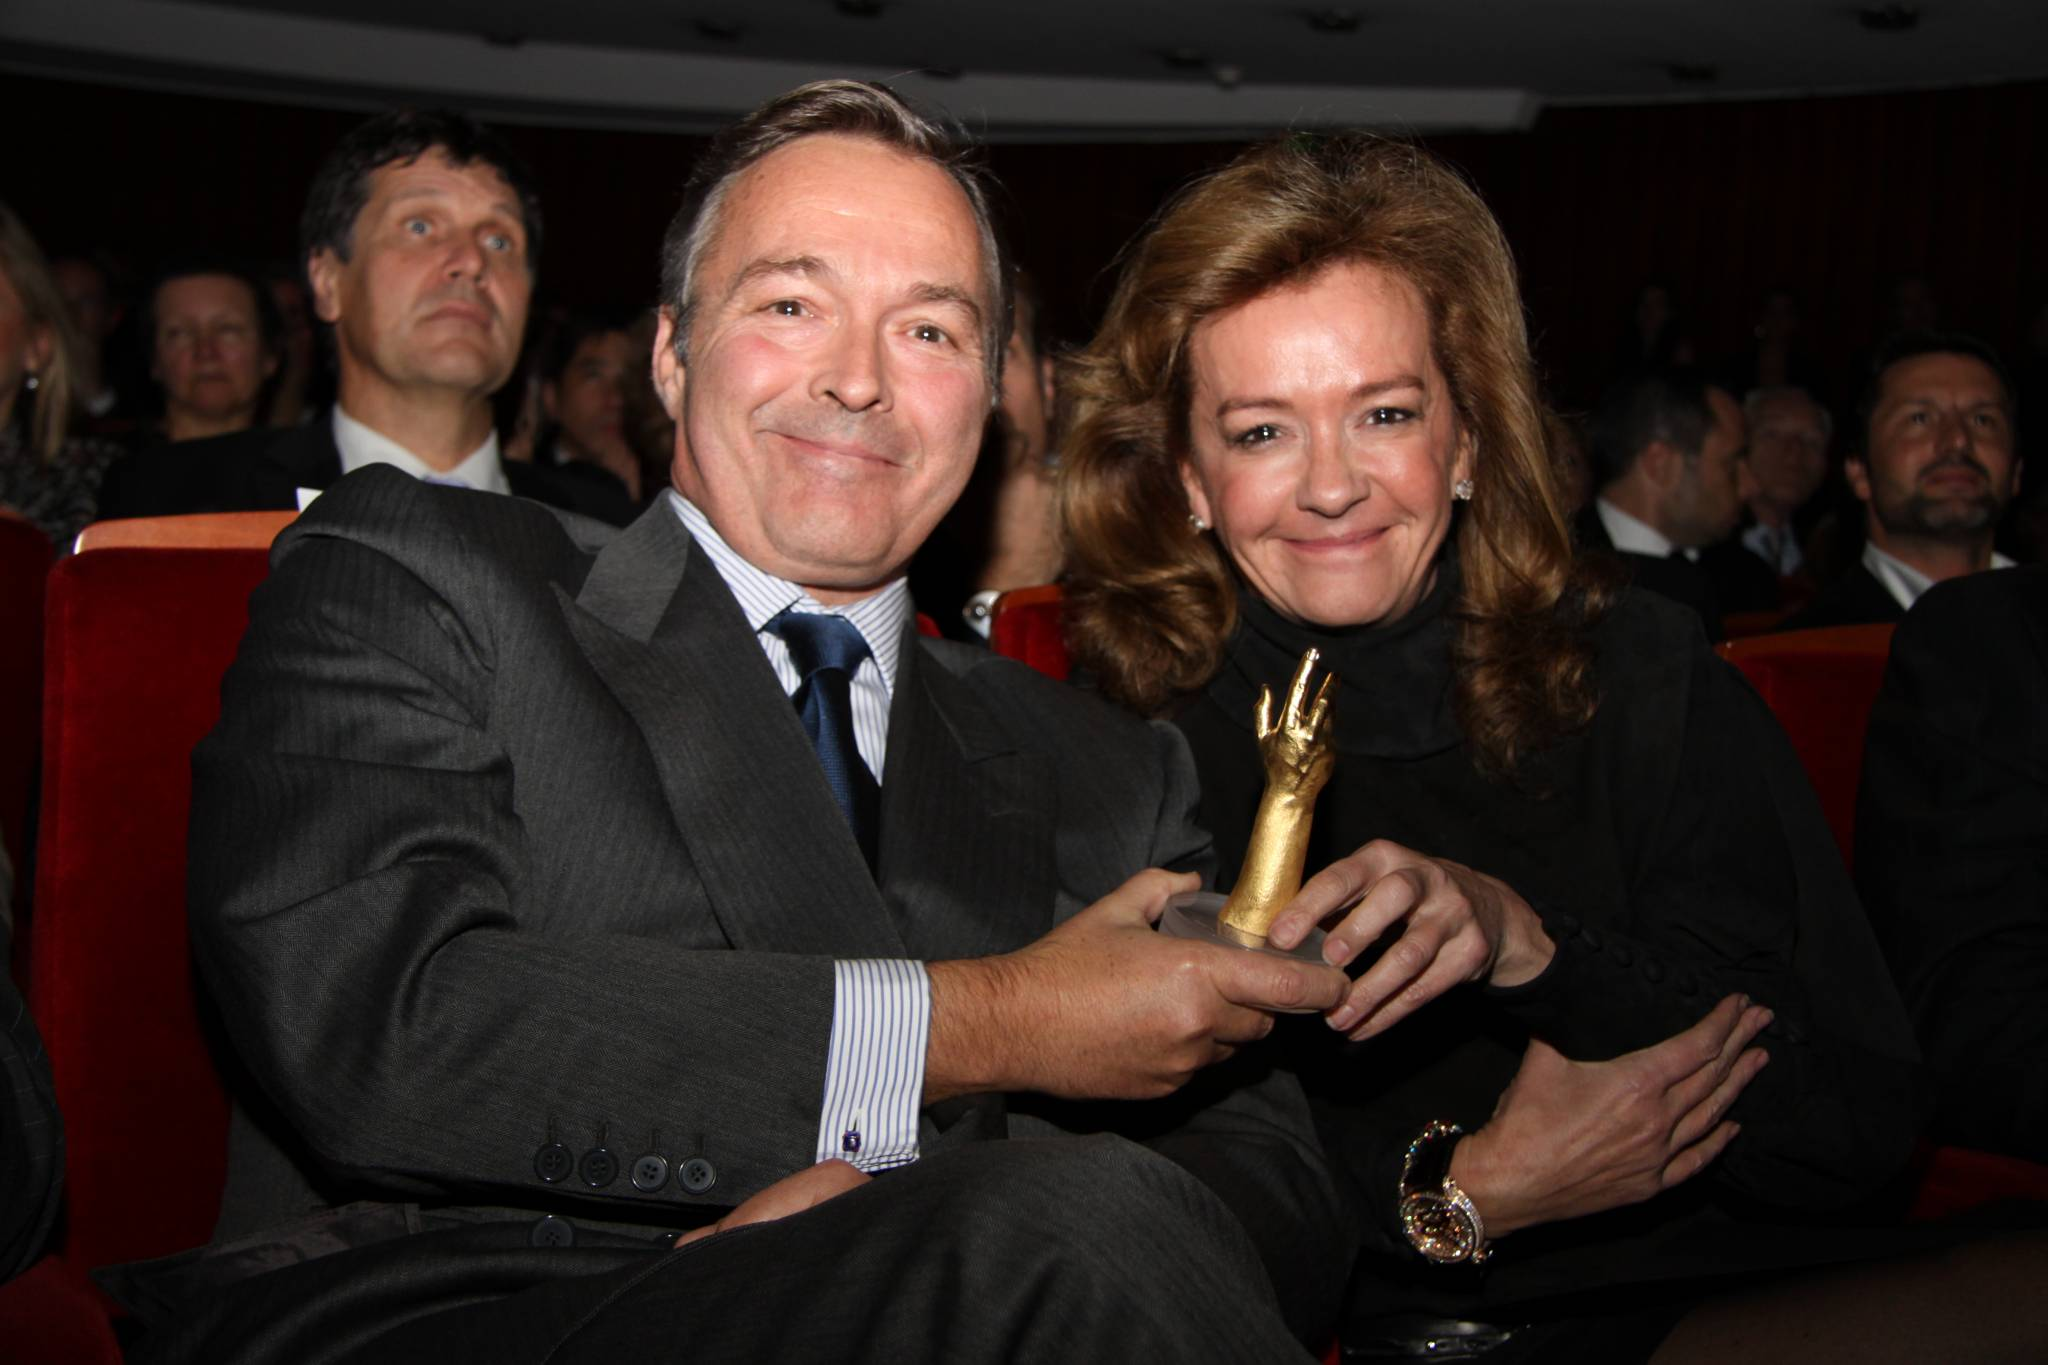 Karl-Friedrich Scheufele and Caroline Scheufele, co-presidents of Chopard, 2010 ceremony